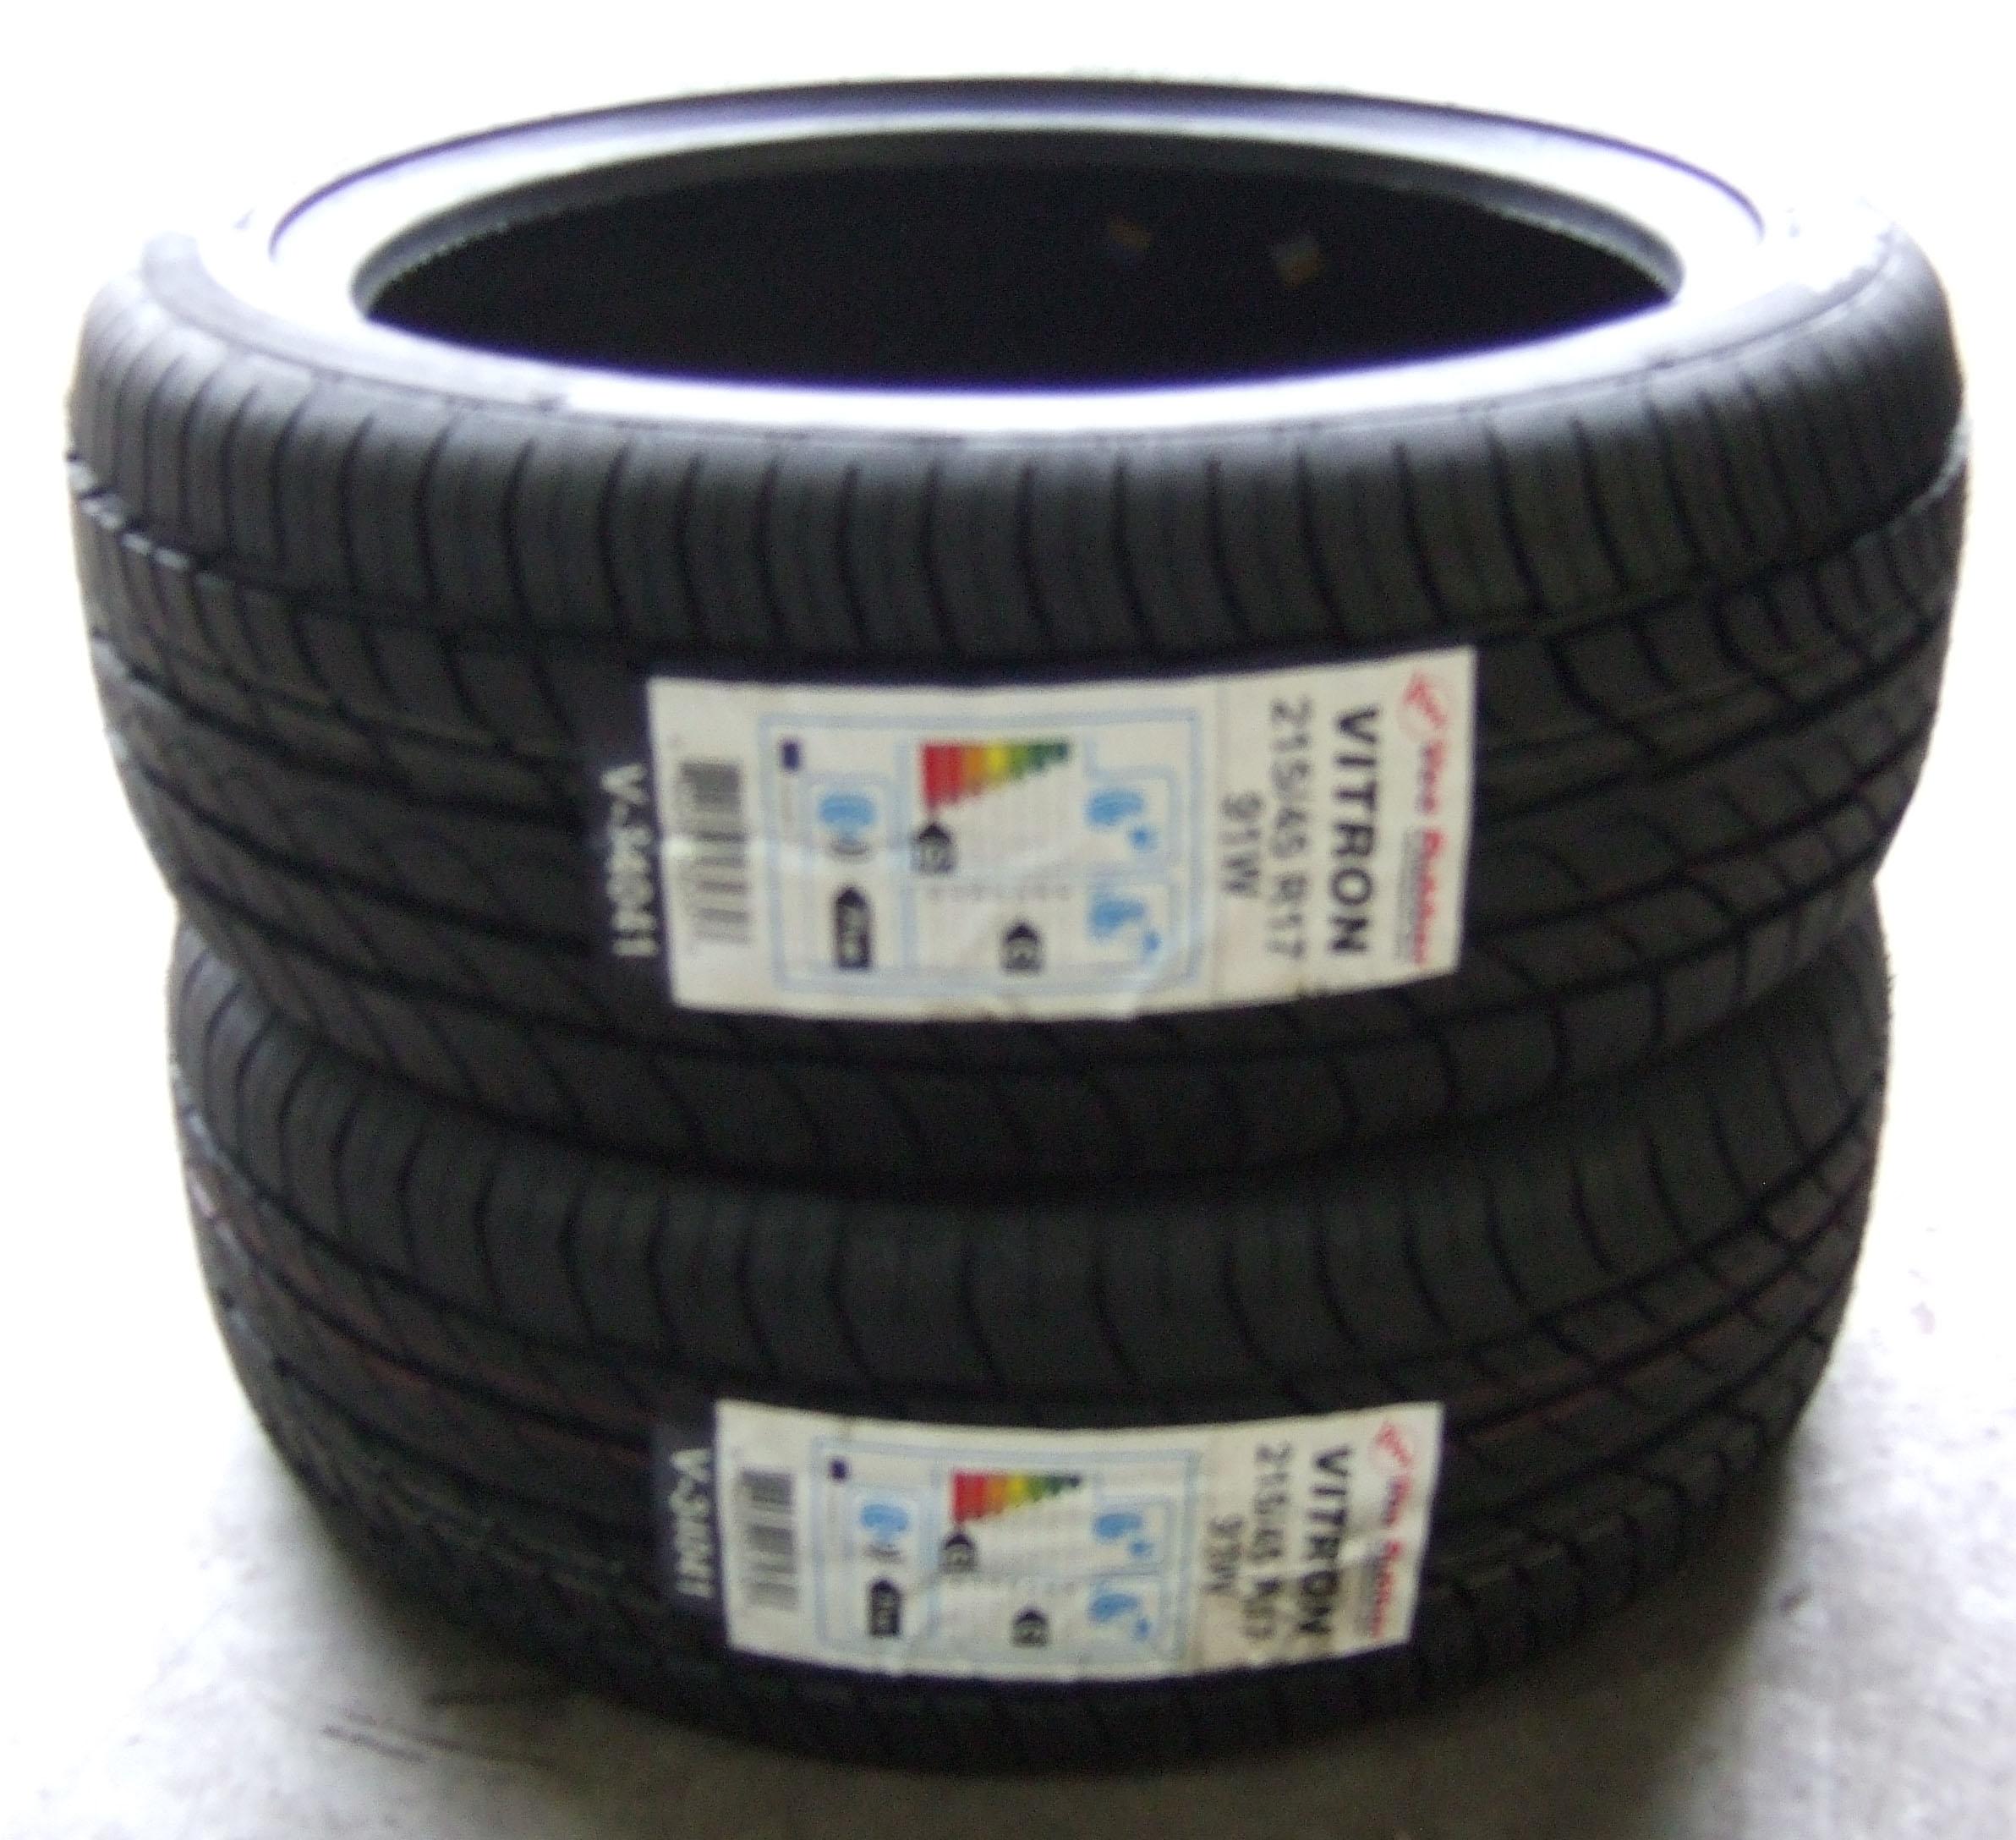 215 45 17 veerubber vitron budget tyres 2154517 91w xl 215 45 17 pair x2 ebay. Black Bedroom Furniture Sets. Home Design Ideas